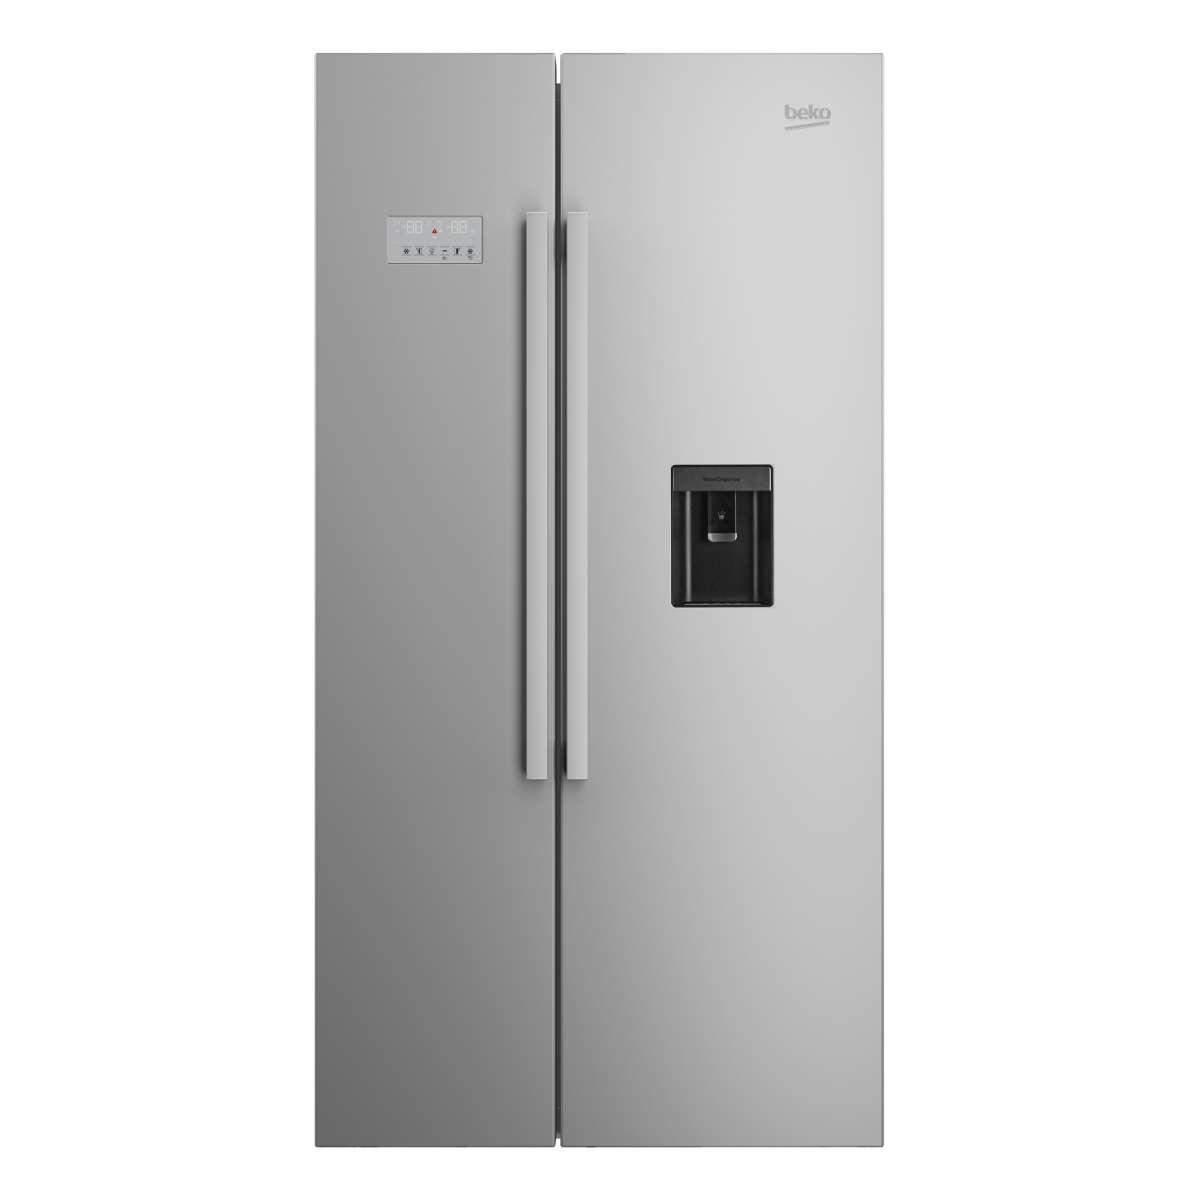 Beko ASD241X Fridge Freezer with 554 Litres Capacity and A+ Energy ...